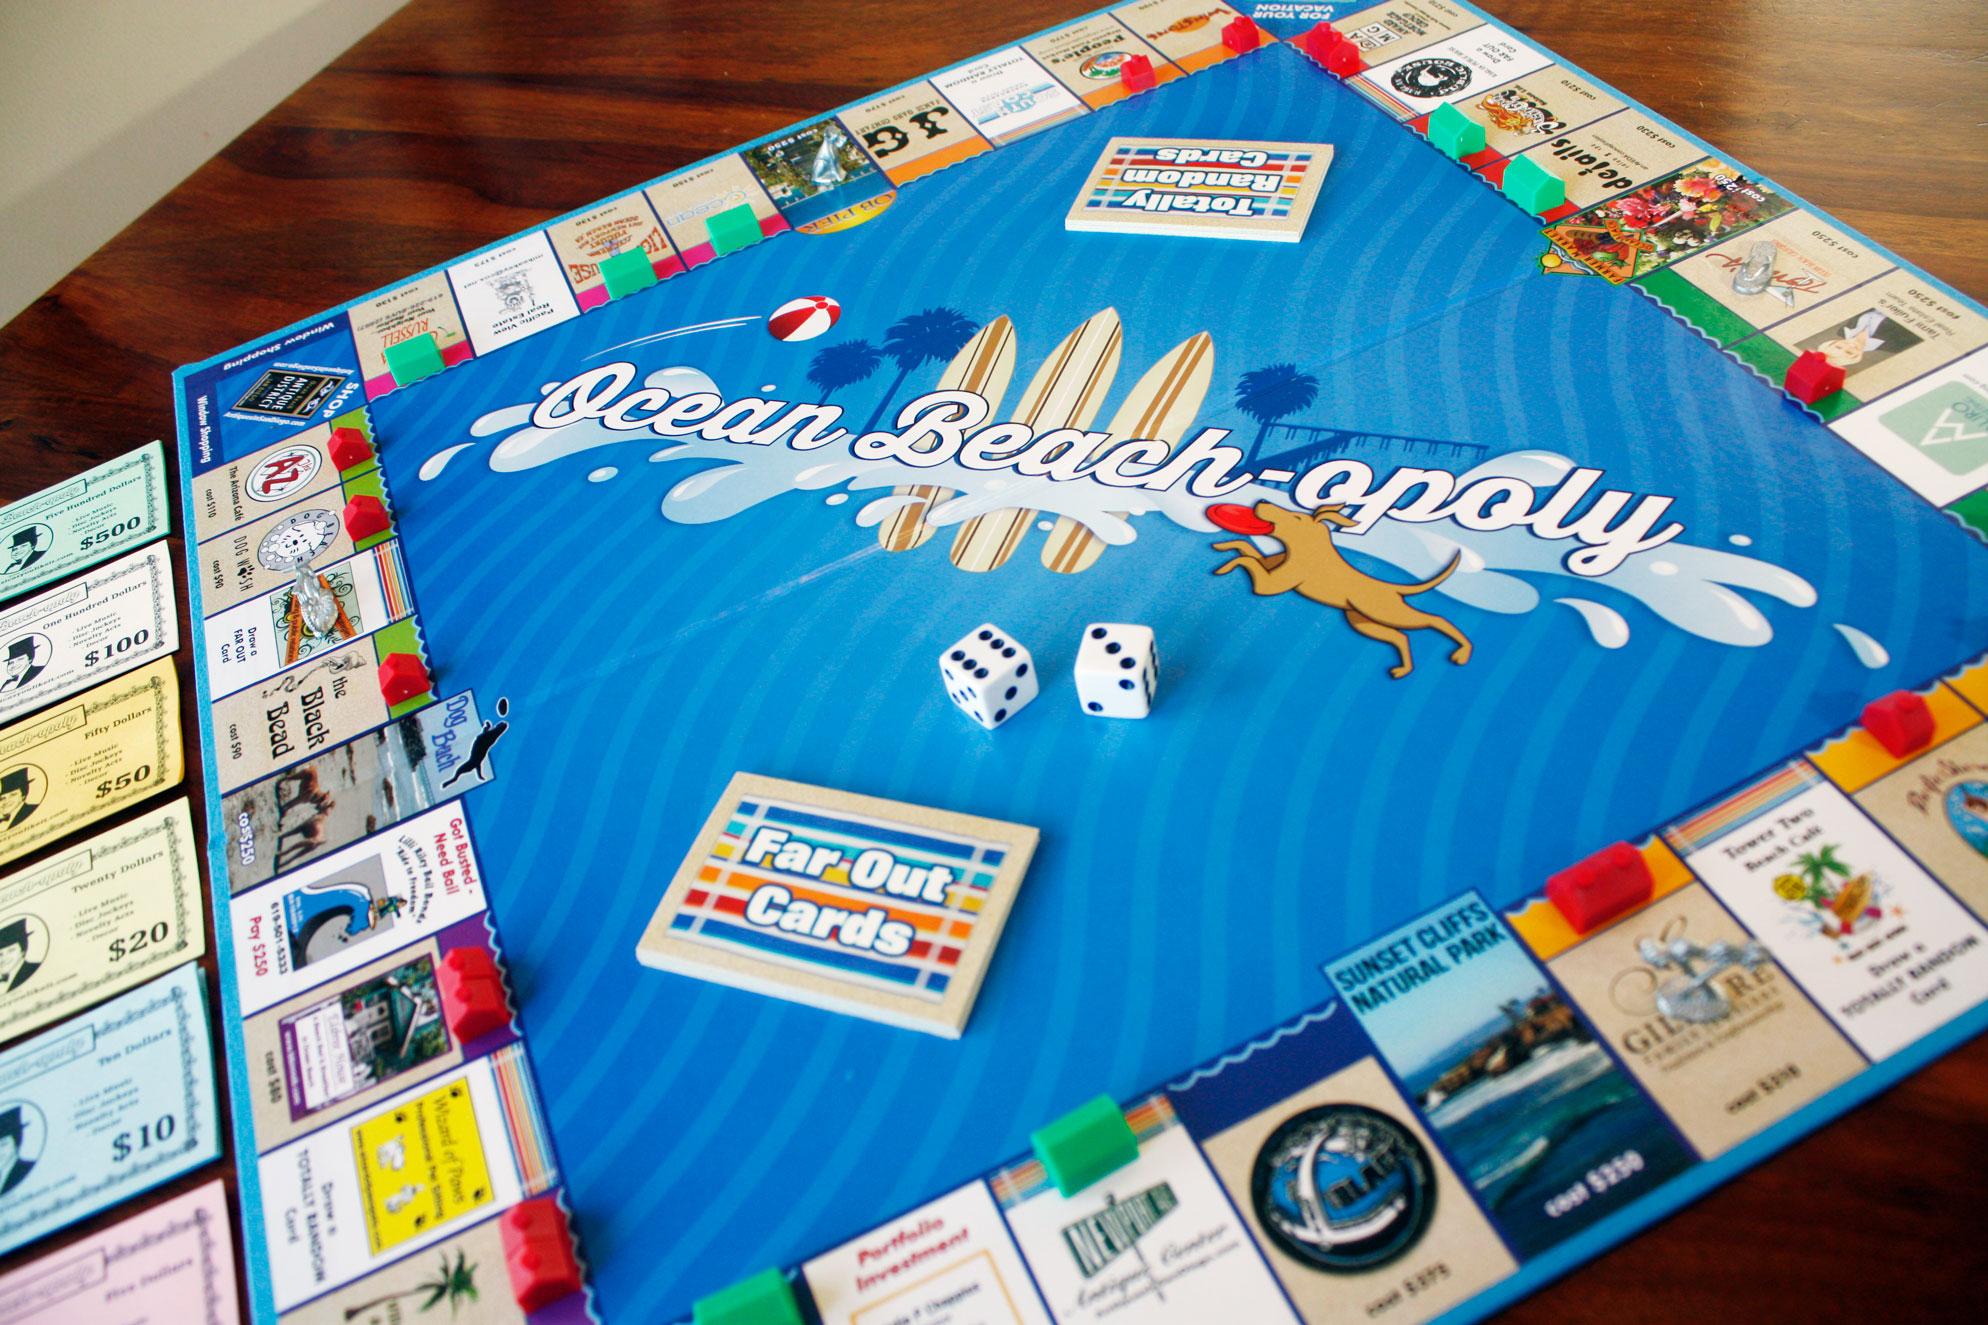 Ocean Beach-opoly game board